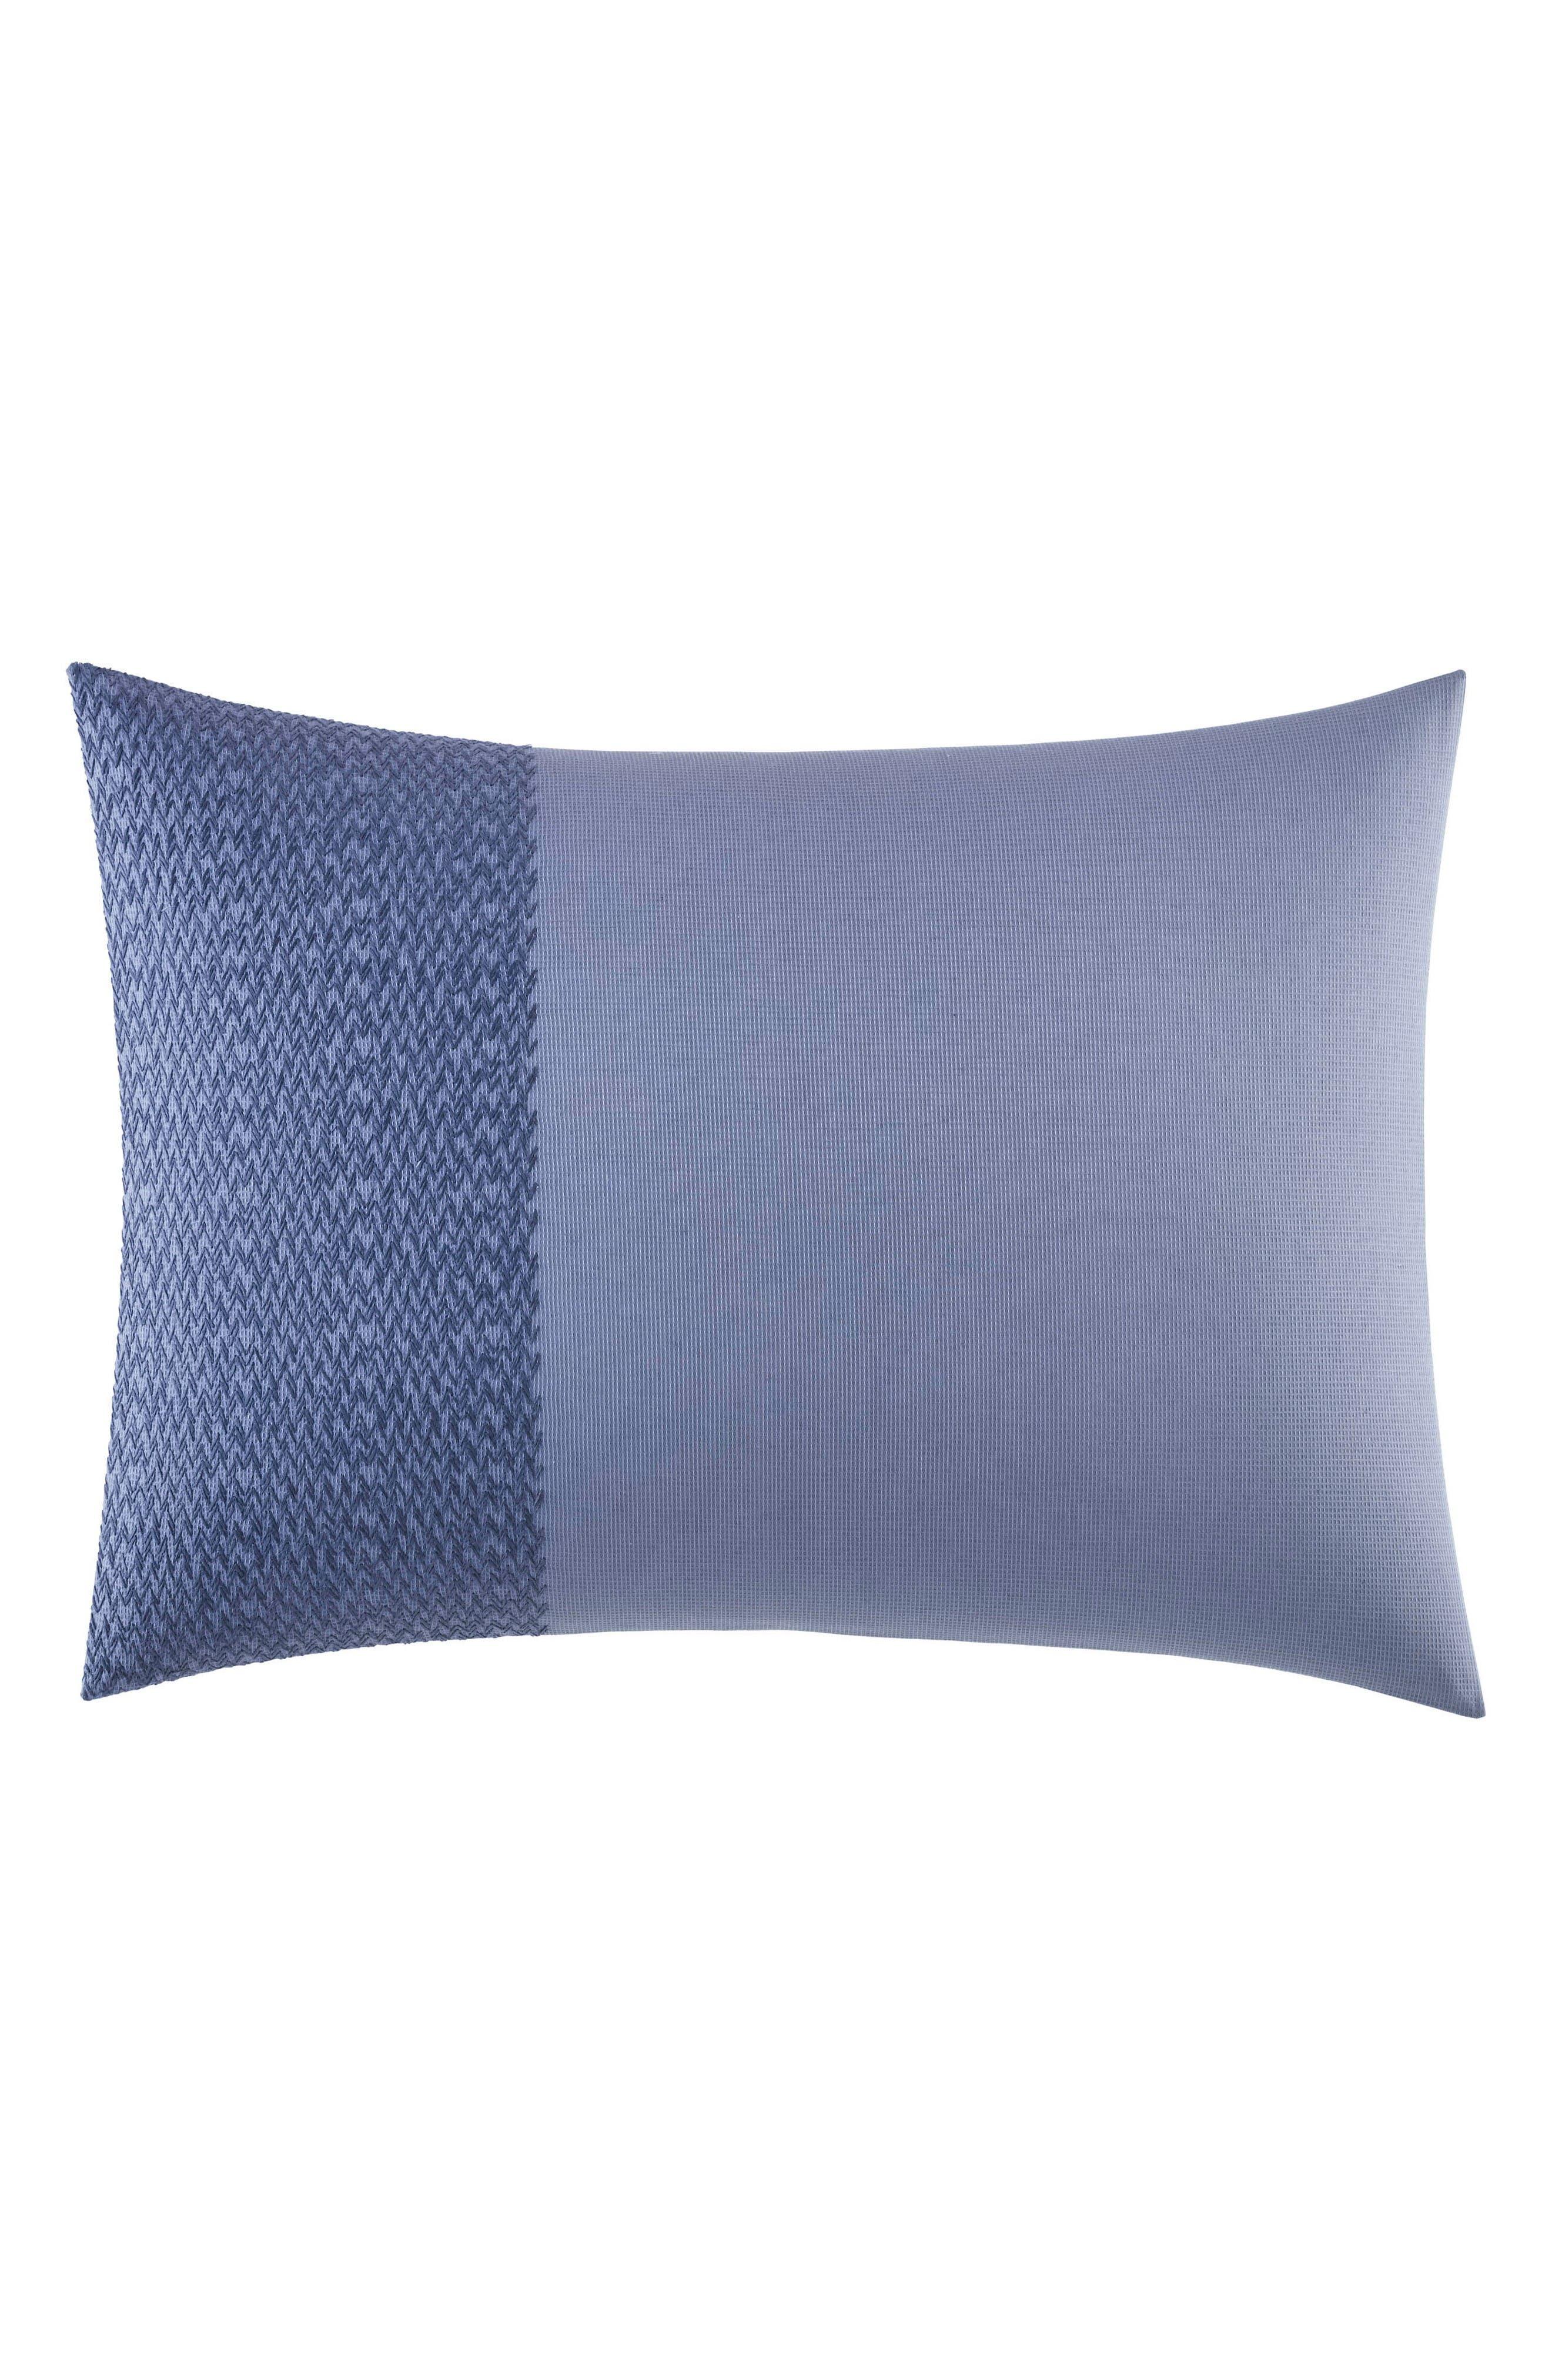 Alternate Image 1 Selected - Vera Wang Chevron Breakfast Pillow